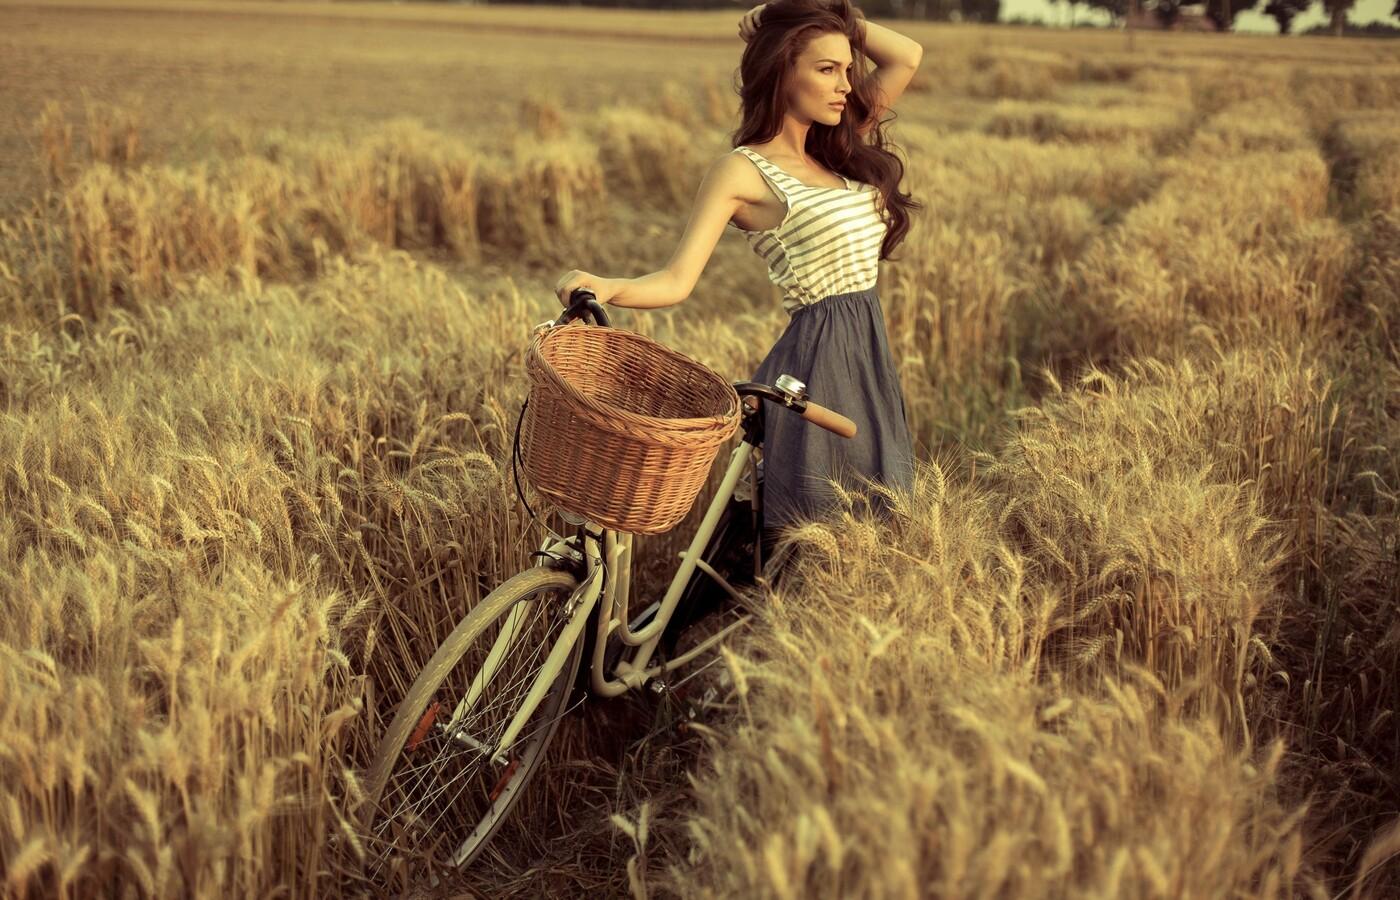 cute-girl-with-cycle-hd.jpg